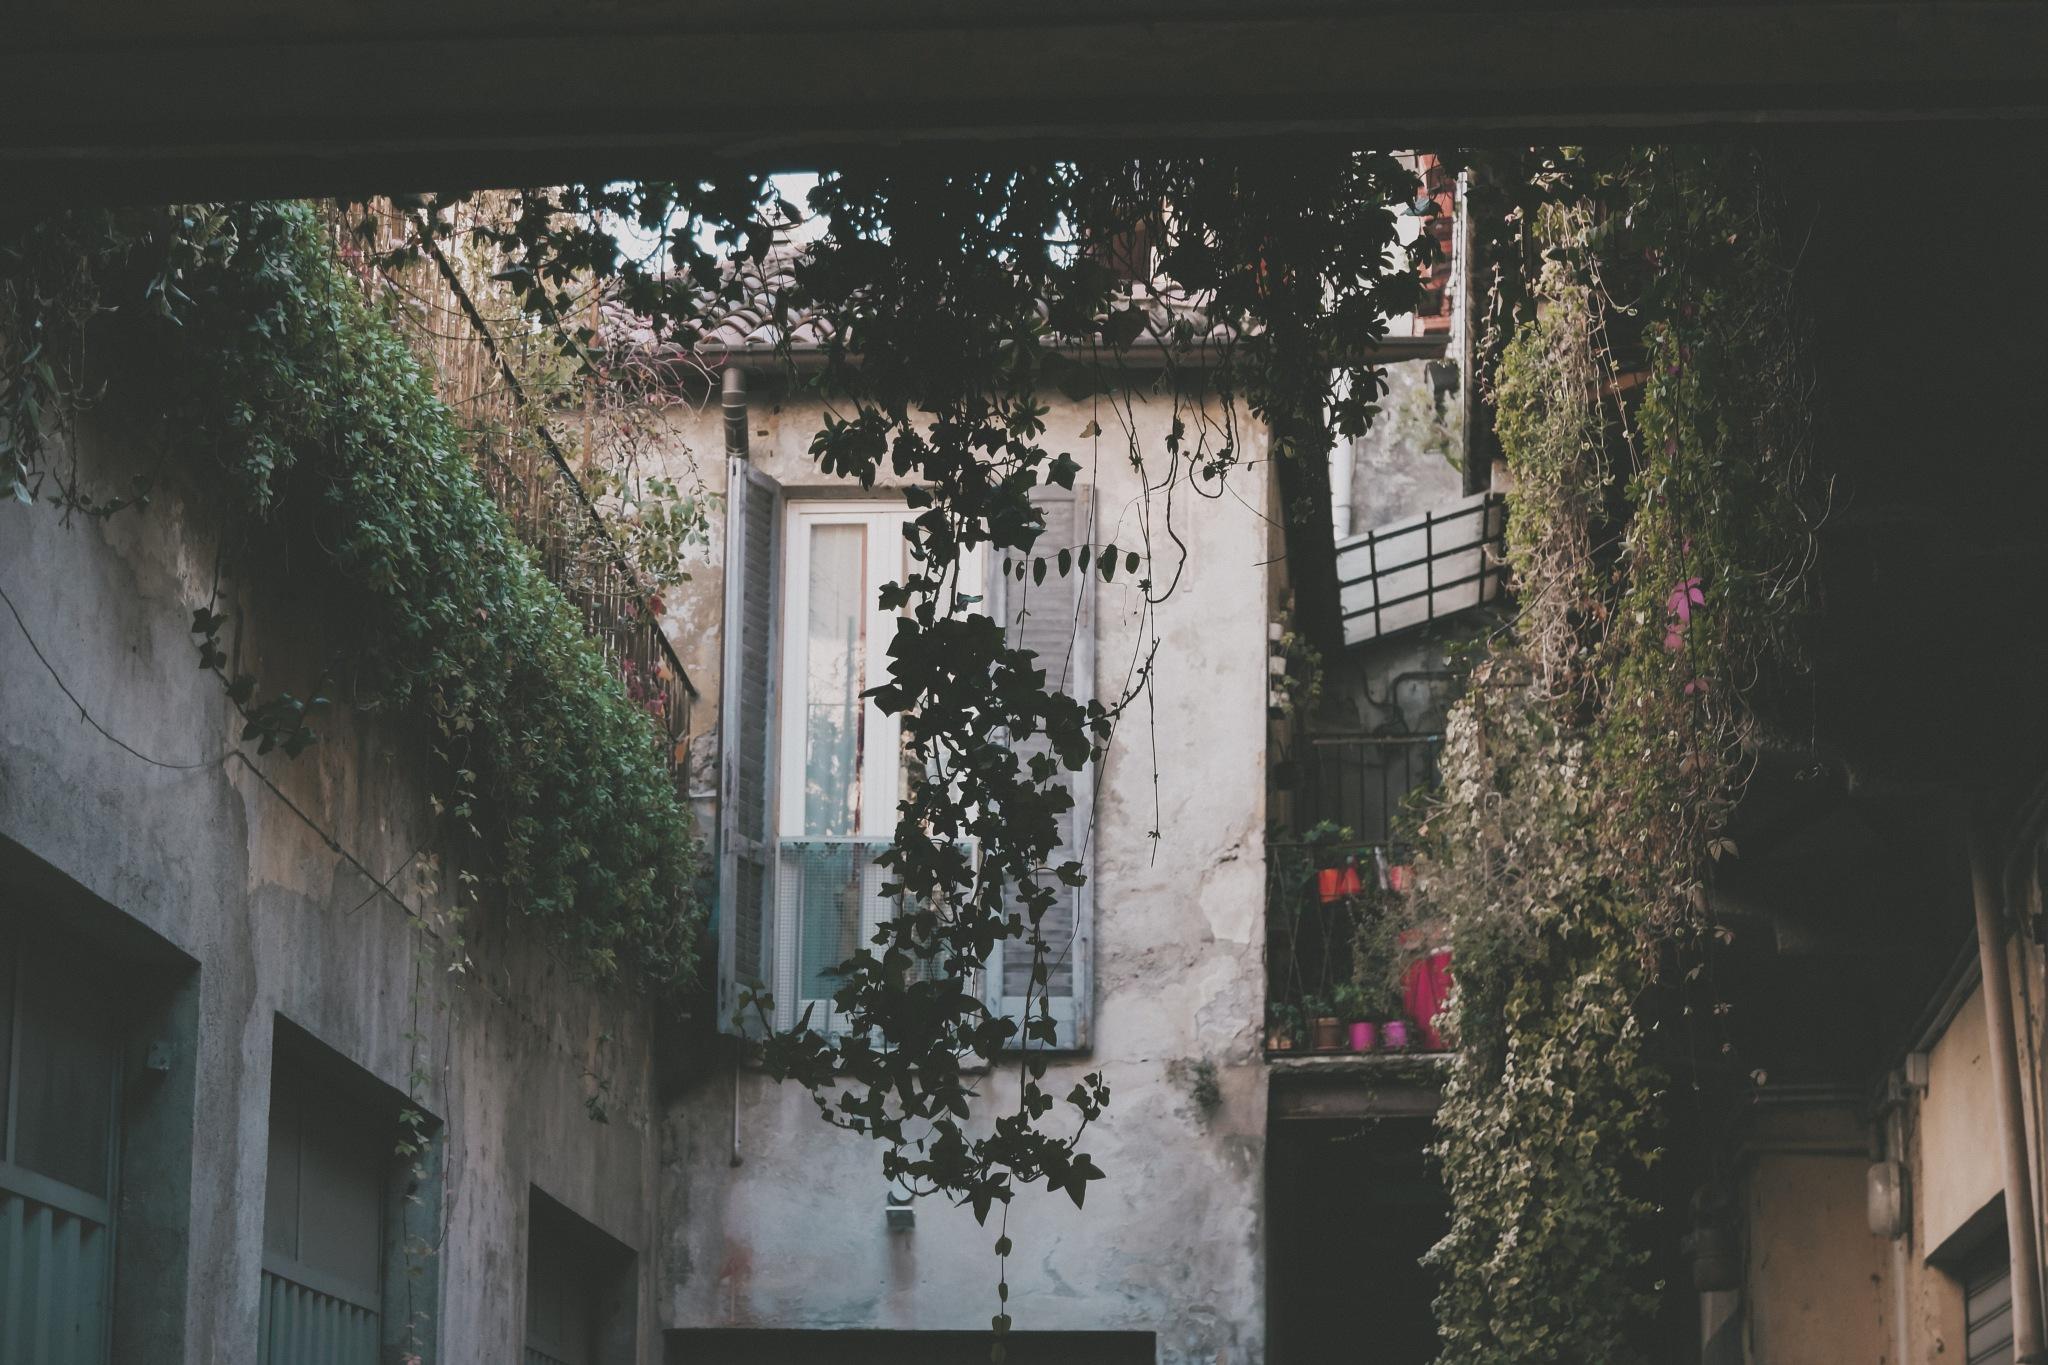 Inner Yard | Como | Italy by b e a t e • t u b a c h